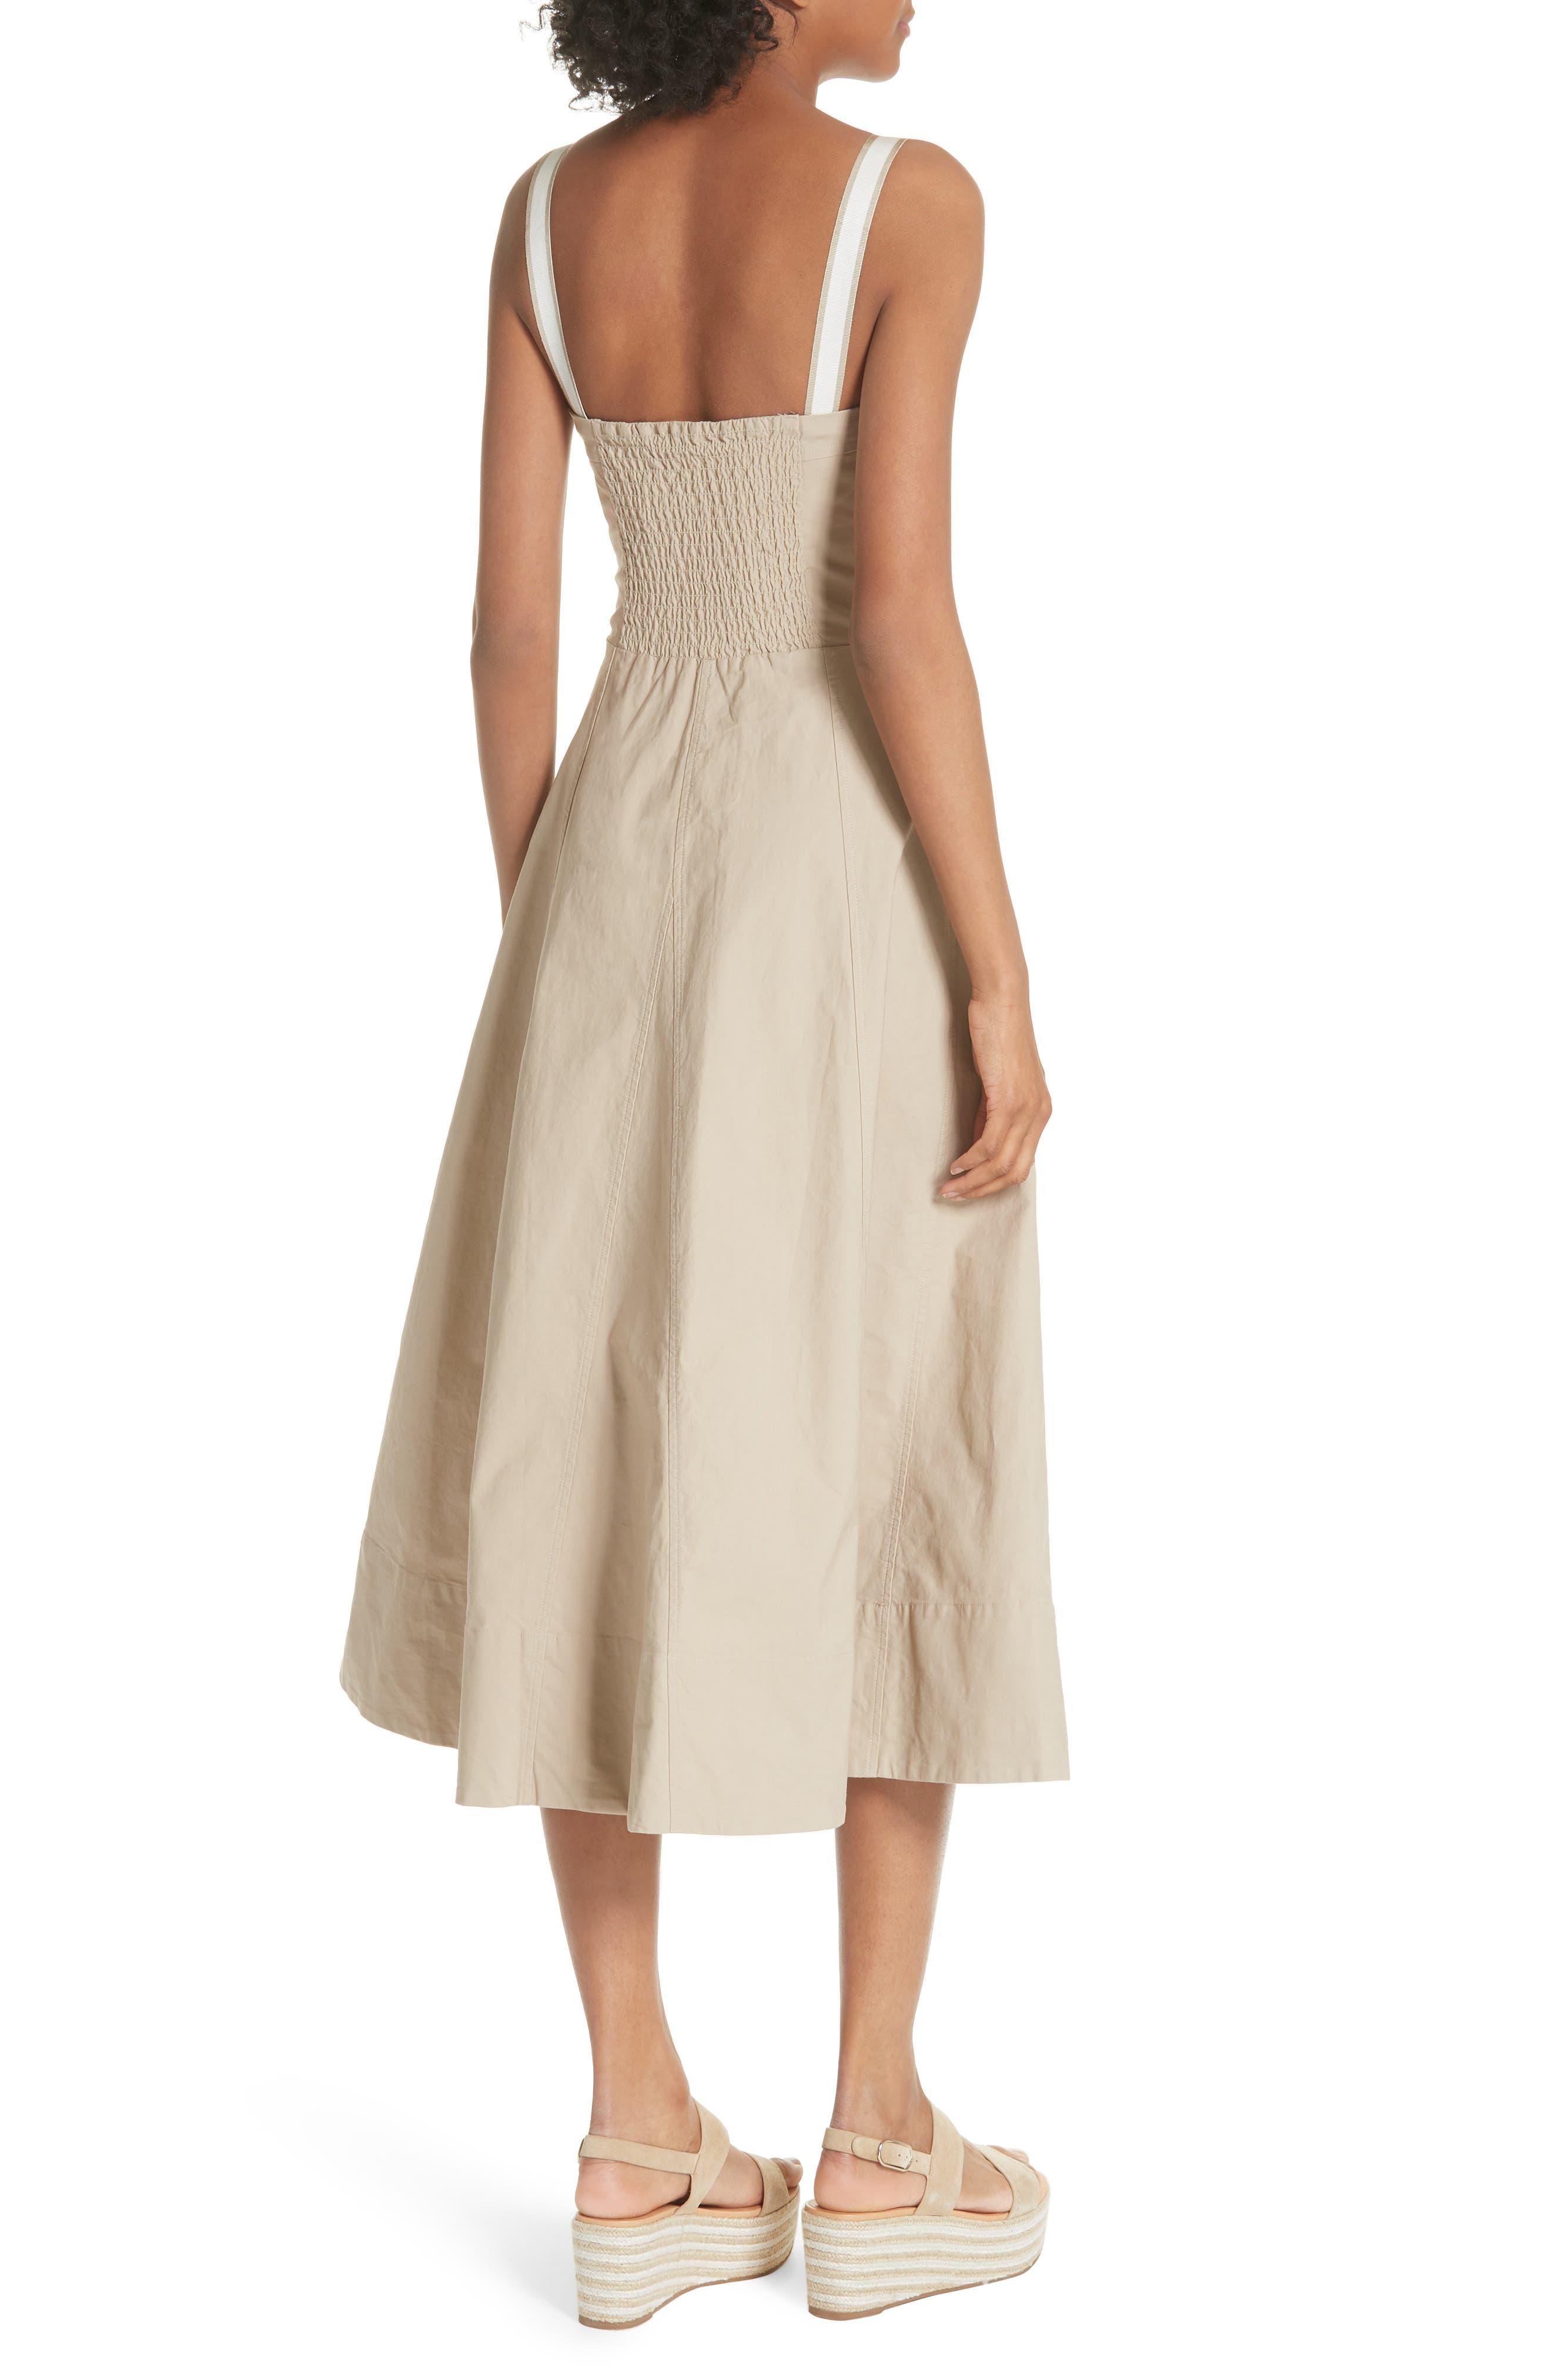 Briel Midi Dress,                             Alternate thumbnail 2, color,                             253